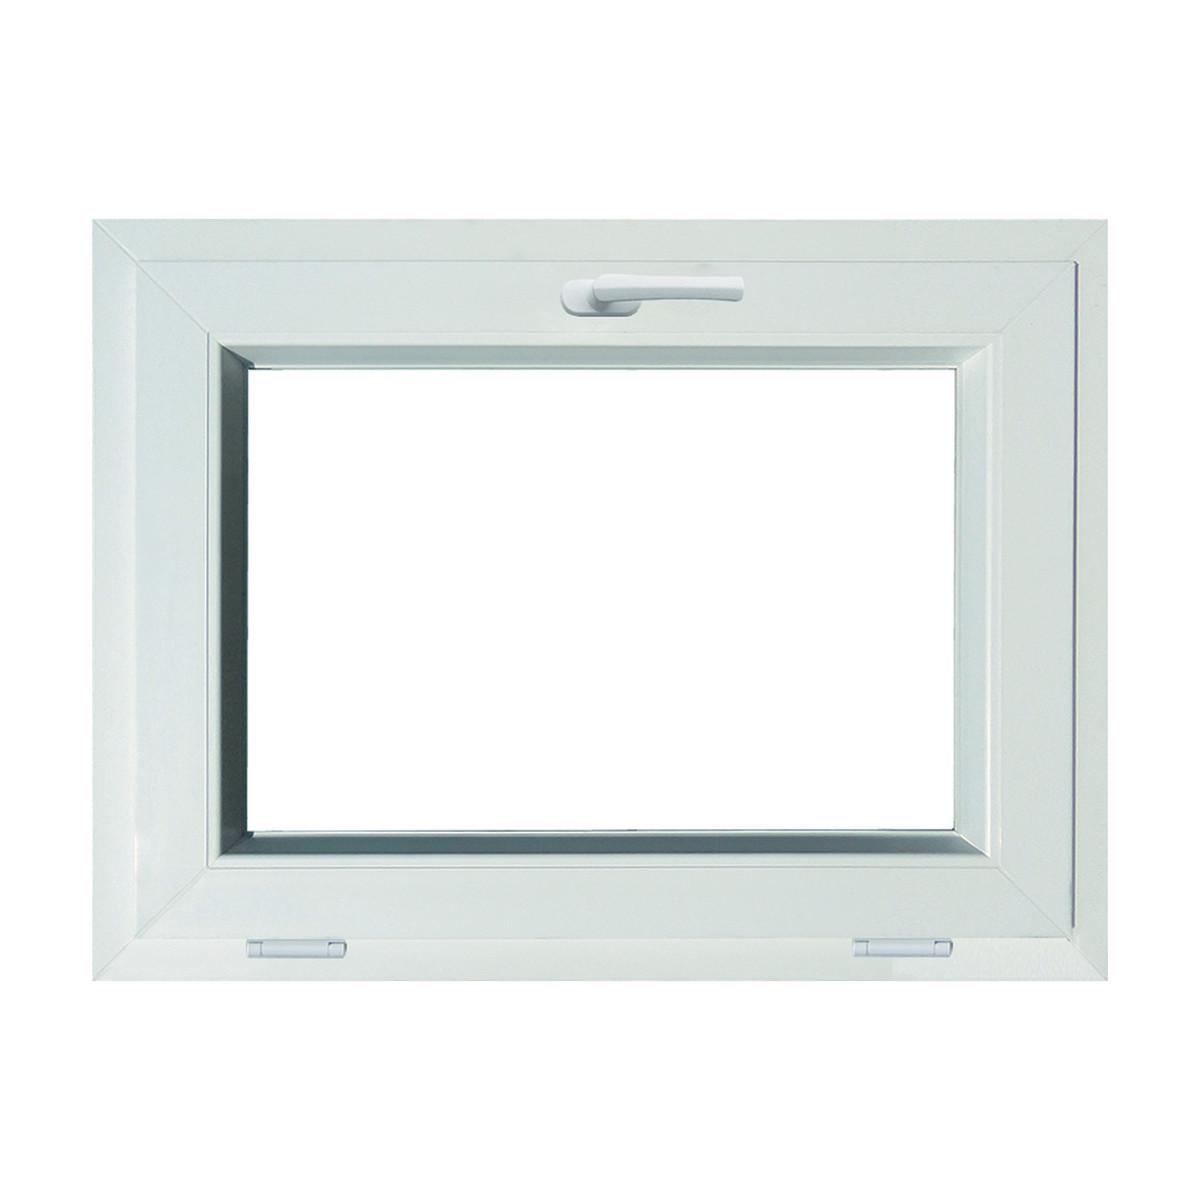 Finestra PVC L 80 x H 60 cm